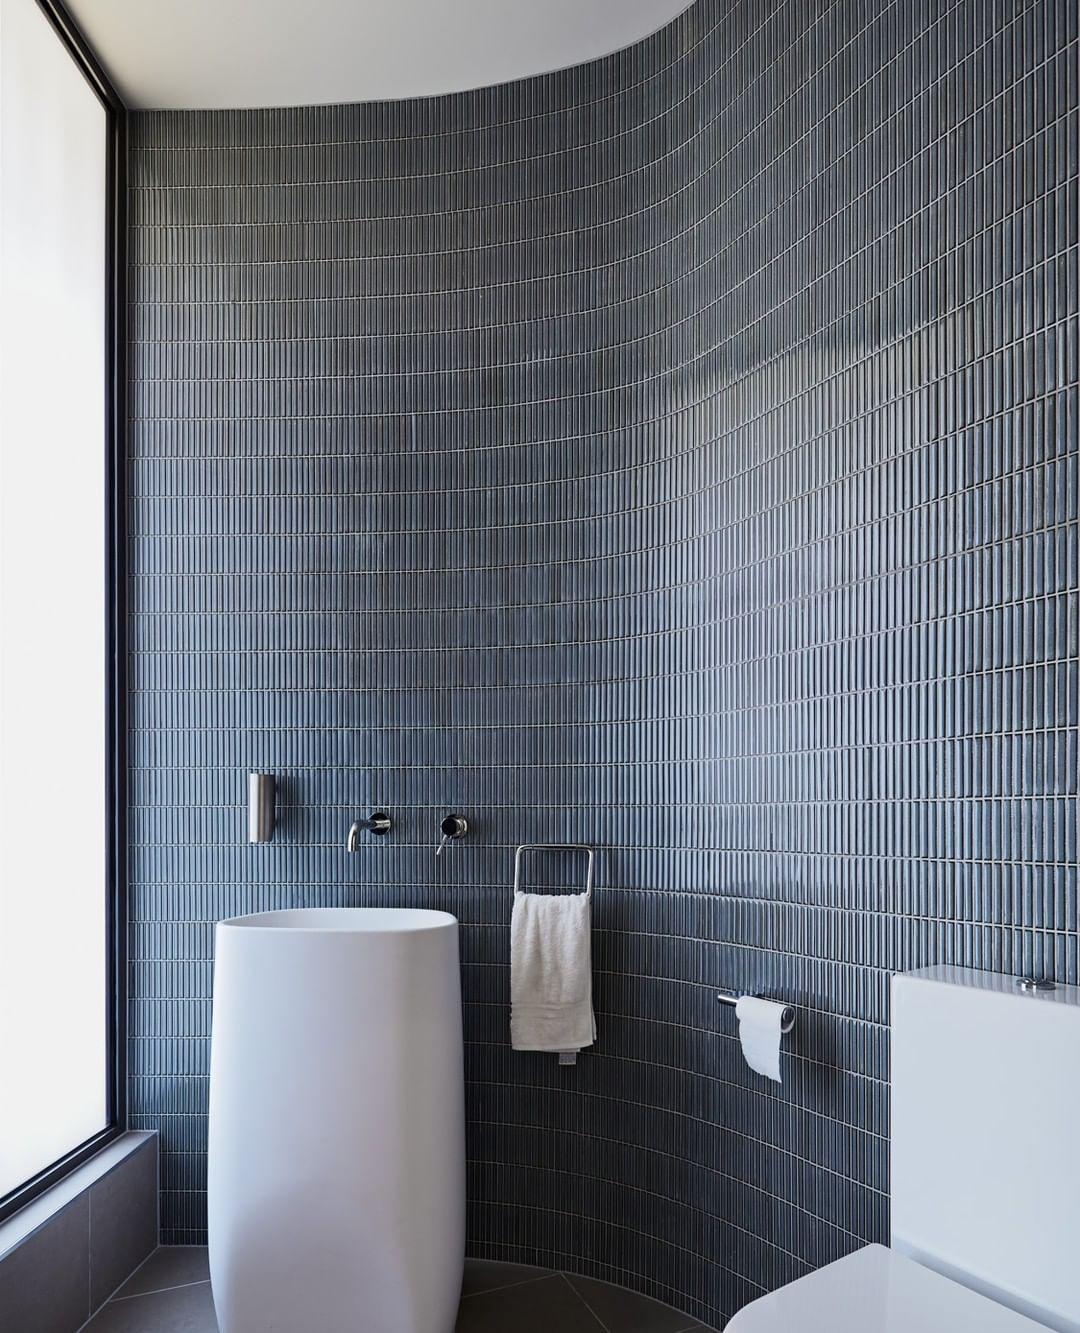 102 Likes 3 Comments Gardinerarchitects Gardinerarchitects On Instagram Undulating Walls And Cha House Bathroom Elegant Bathroom Master Bathroom Design